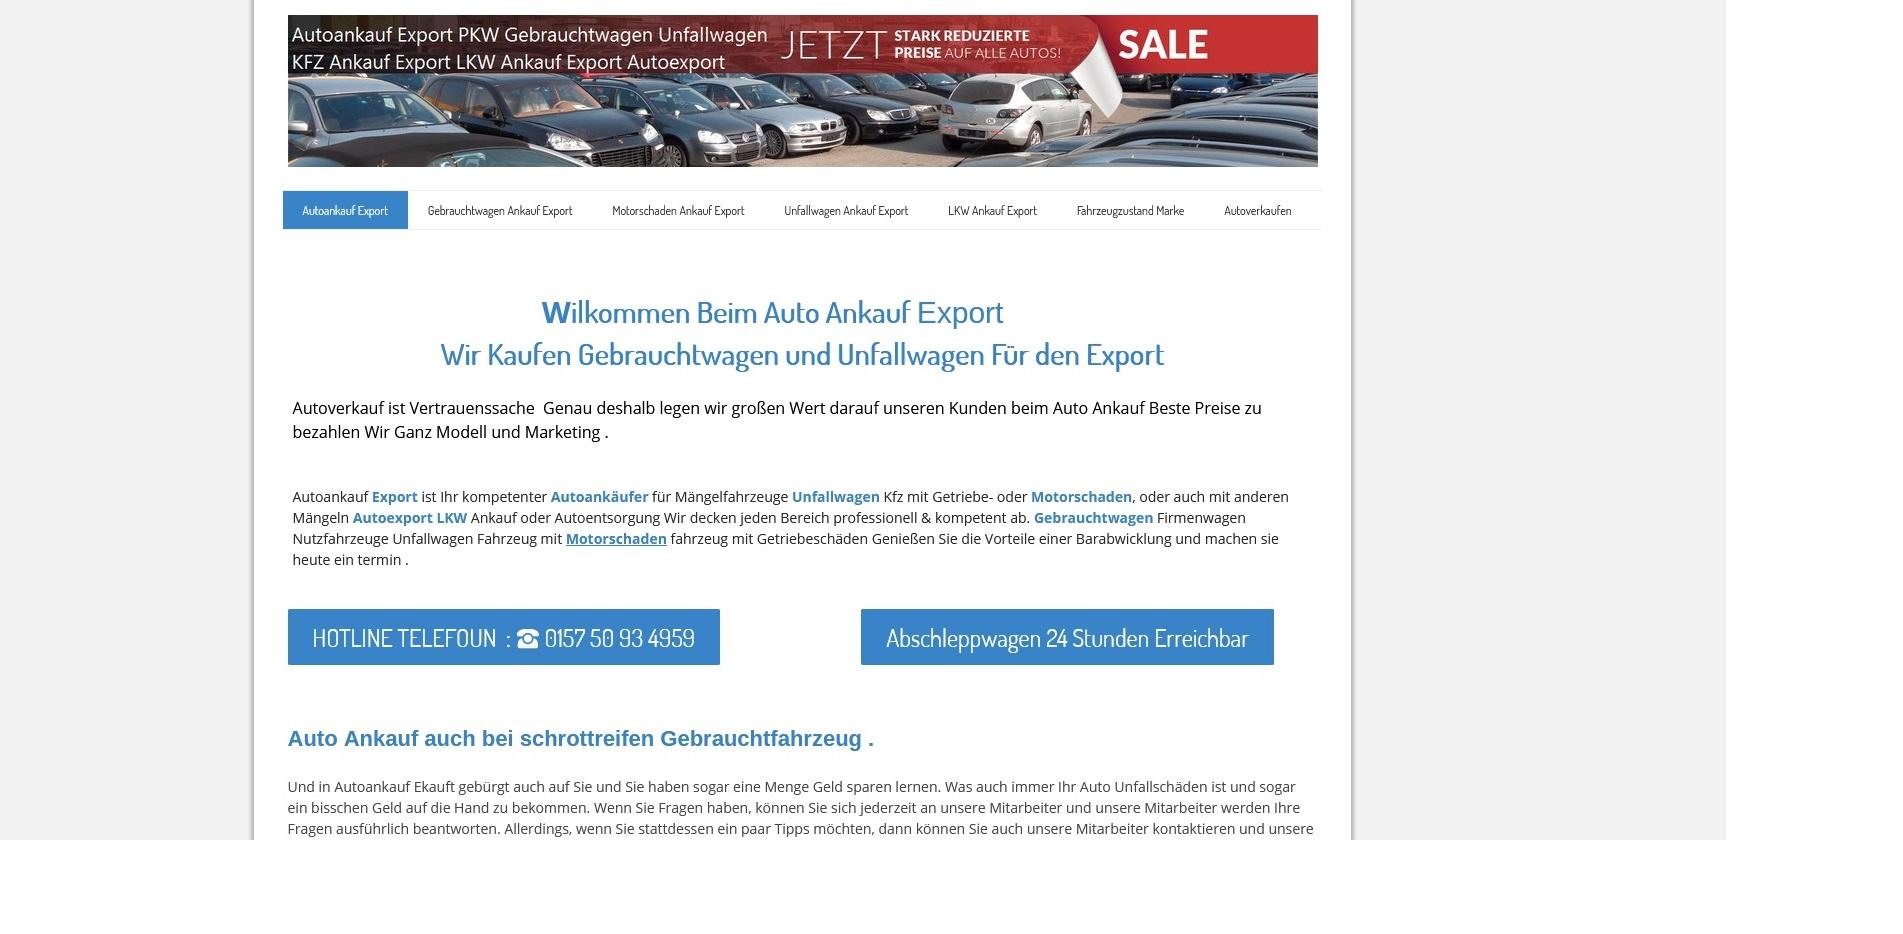 https://www.kfz-ankauf-export.de - Autoankauf Homburg